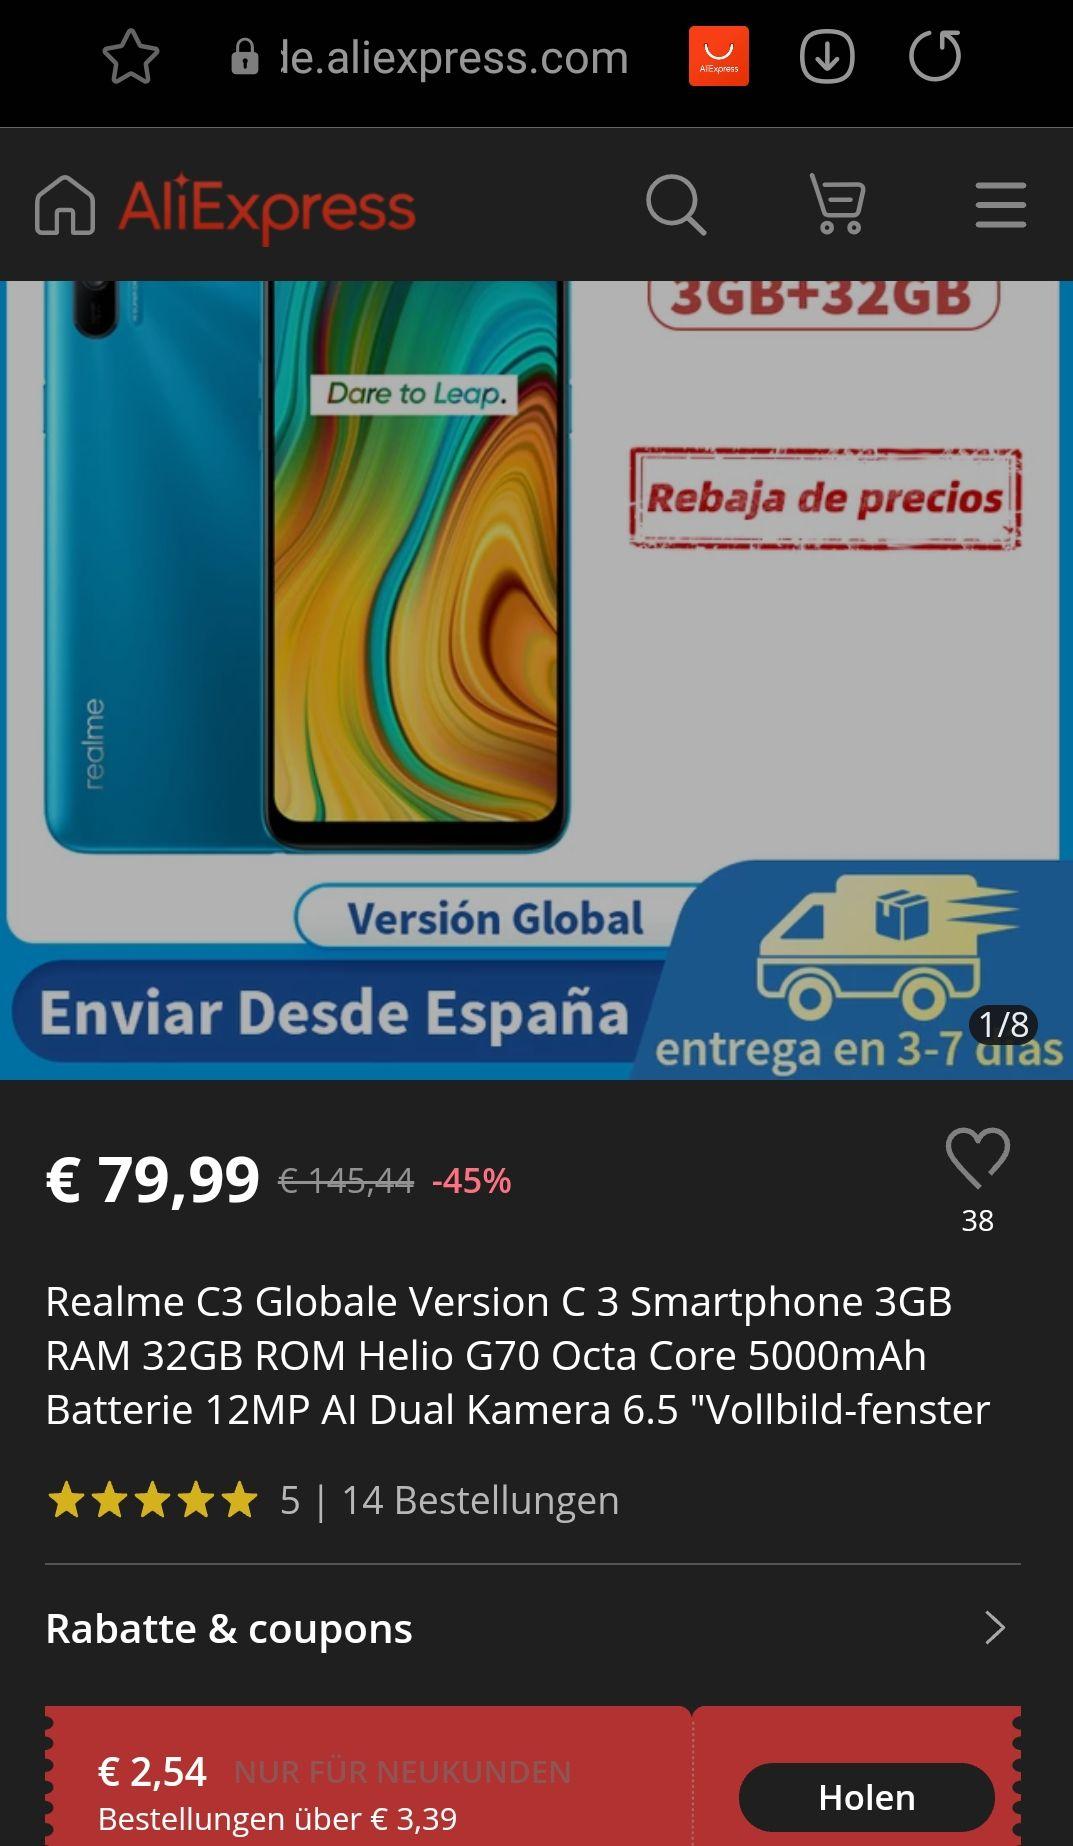 Realme C3 3/32GB 6.5zoll Global Version 5000mAh zollfrei EU-Lager